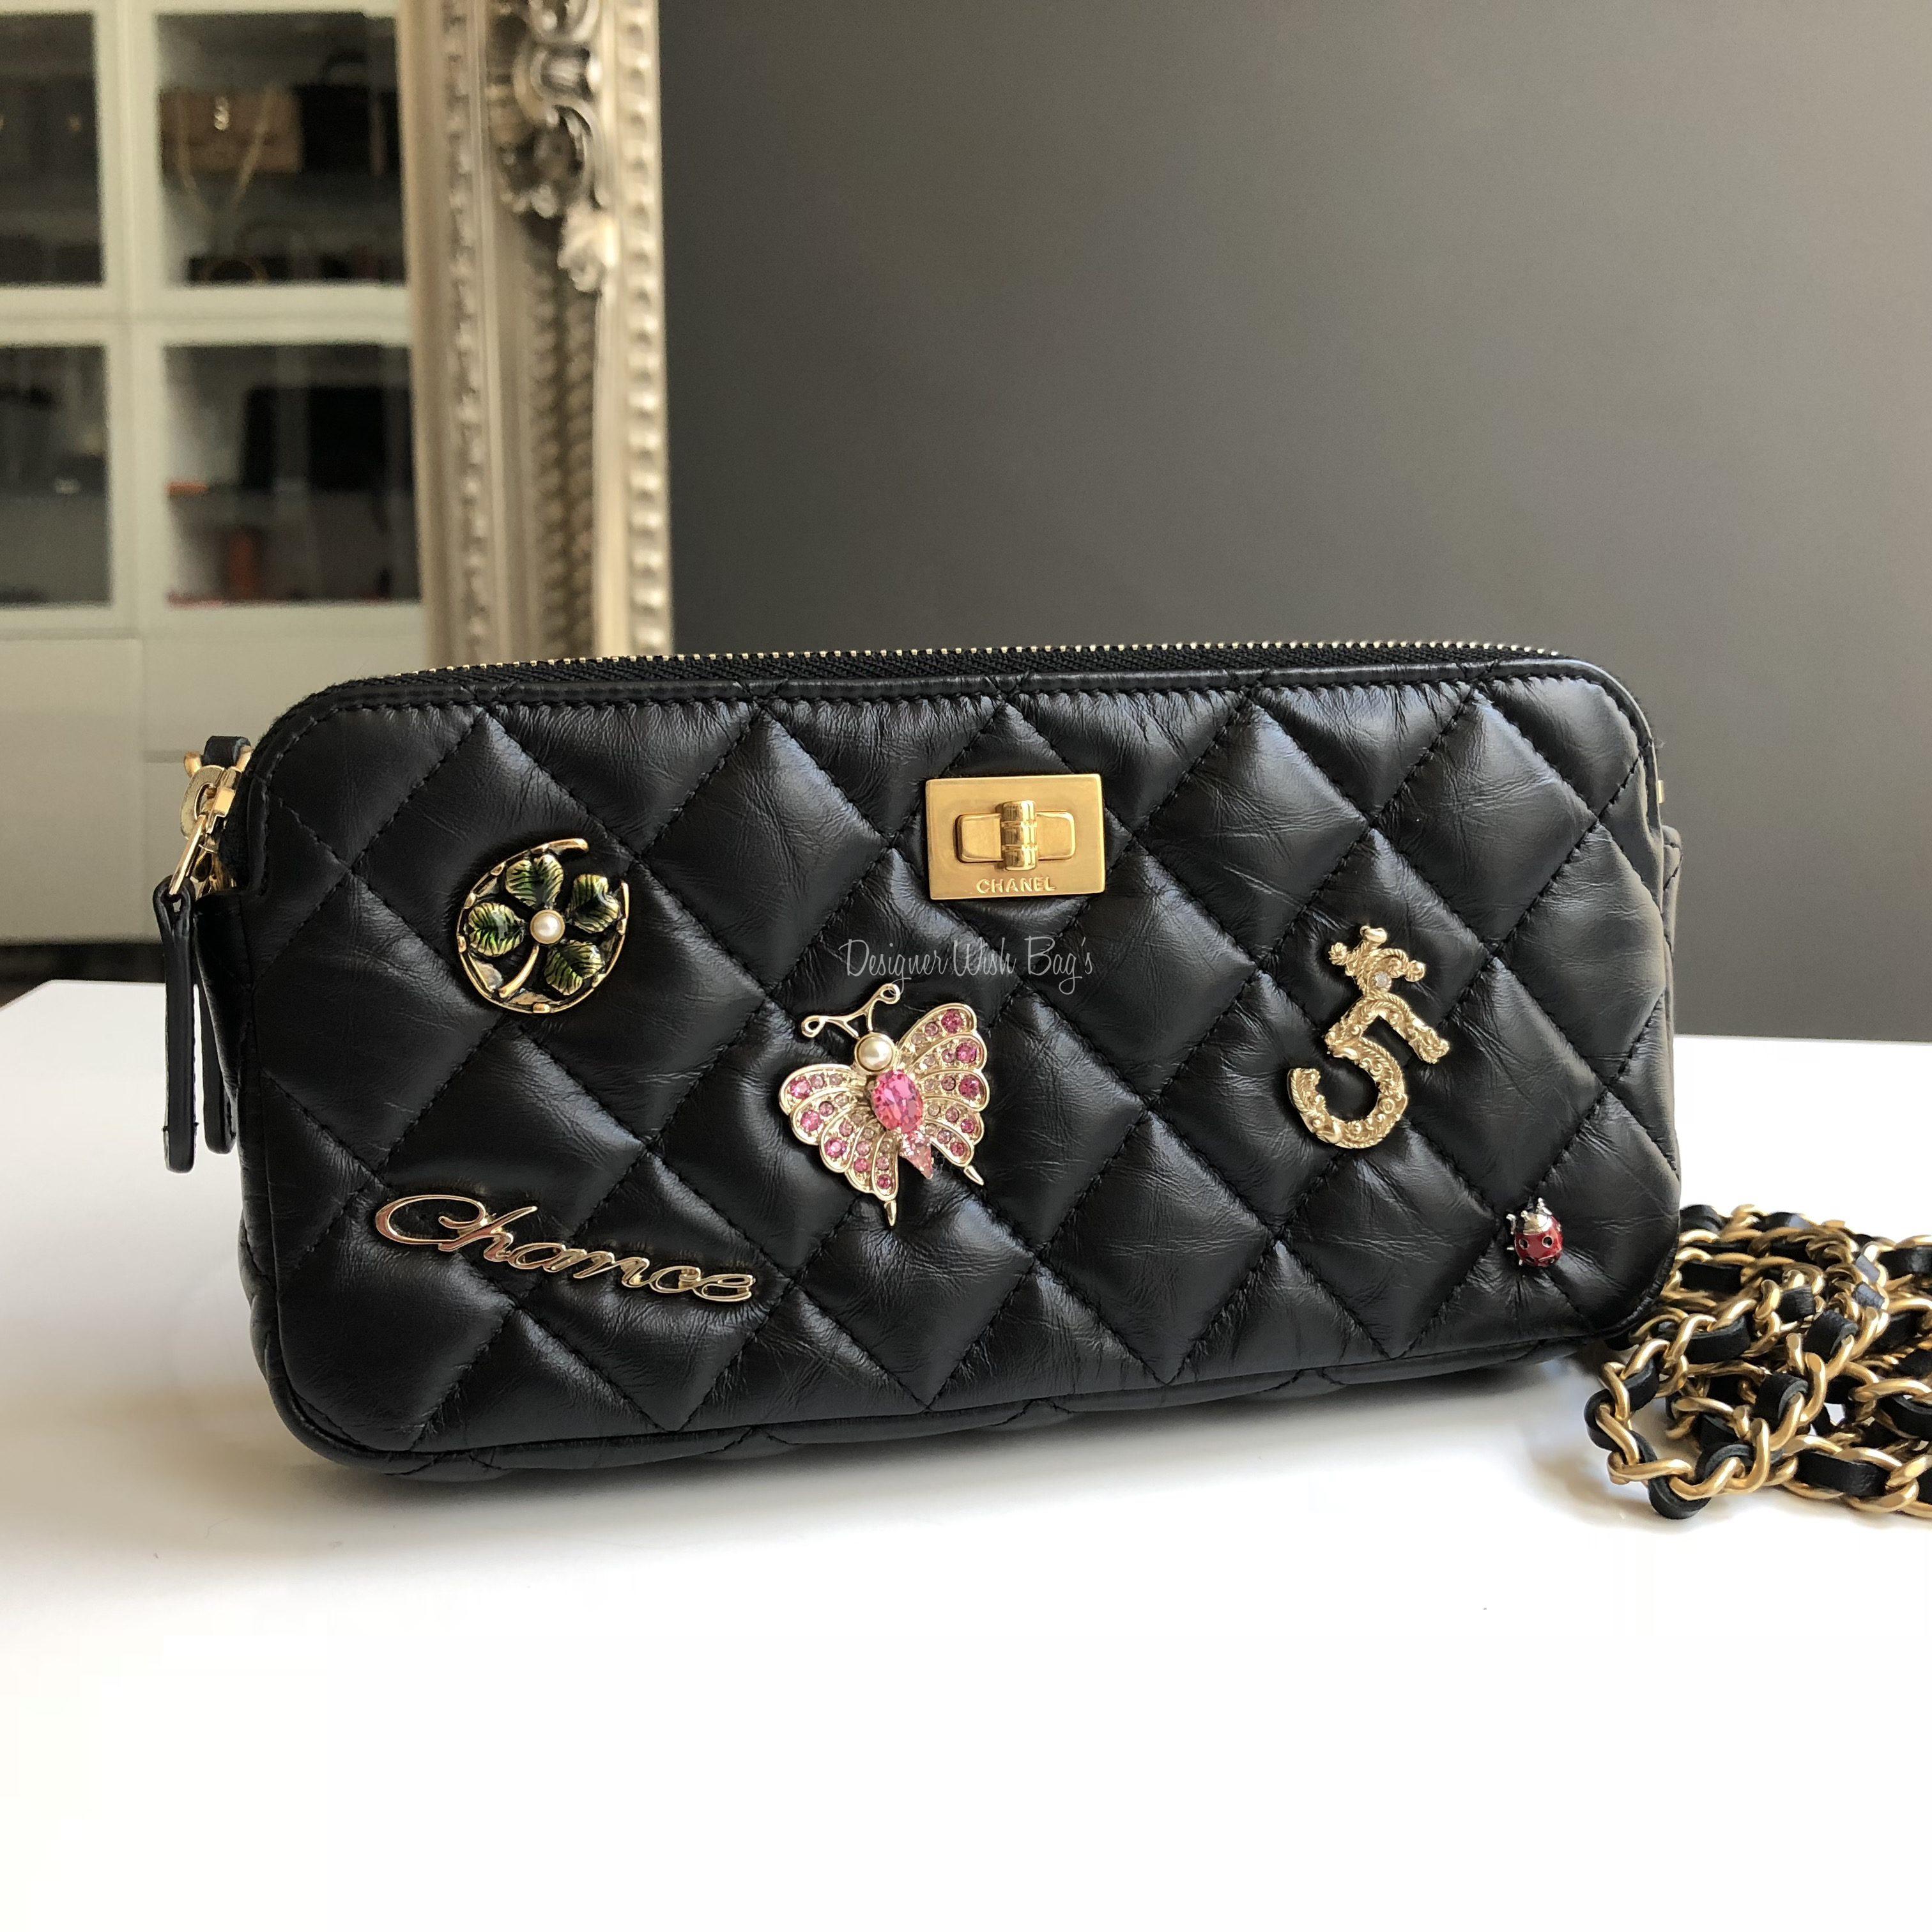 c745f3c8e756 Chanel clutch on chain charms jpg 3024x3024 Chanel clutch